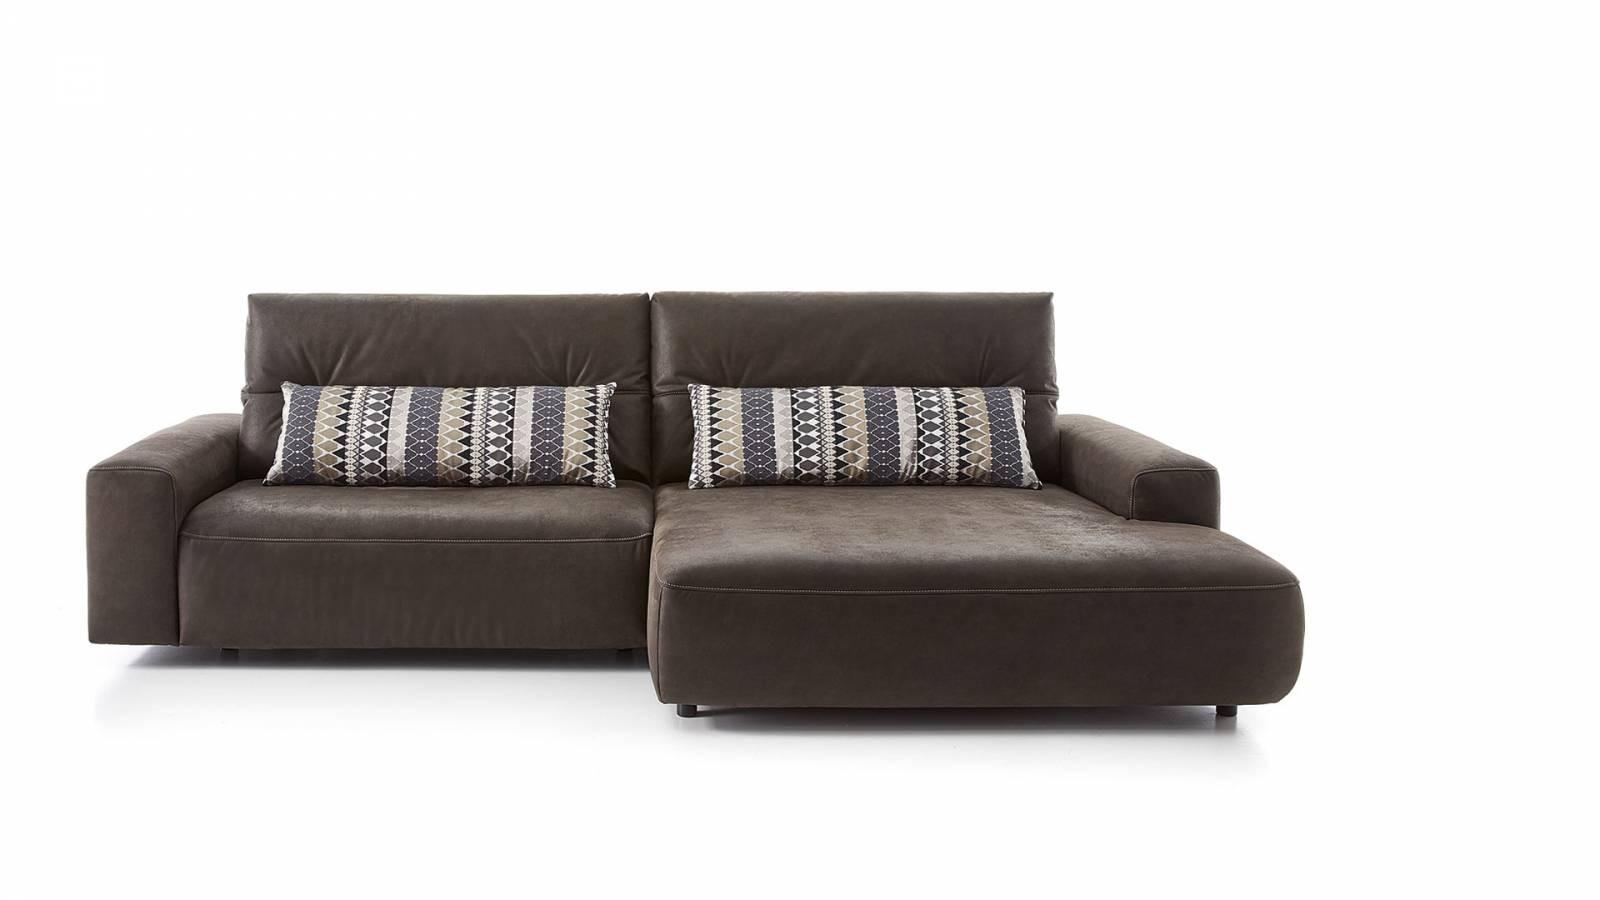 Canapea modernă Koinor Colambo